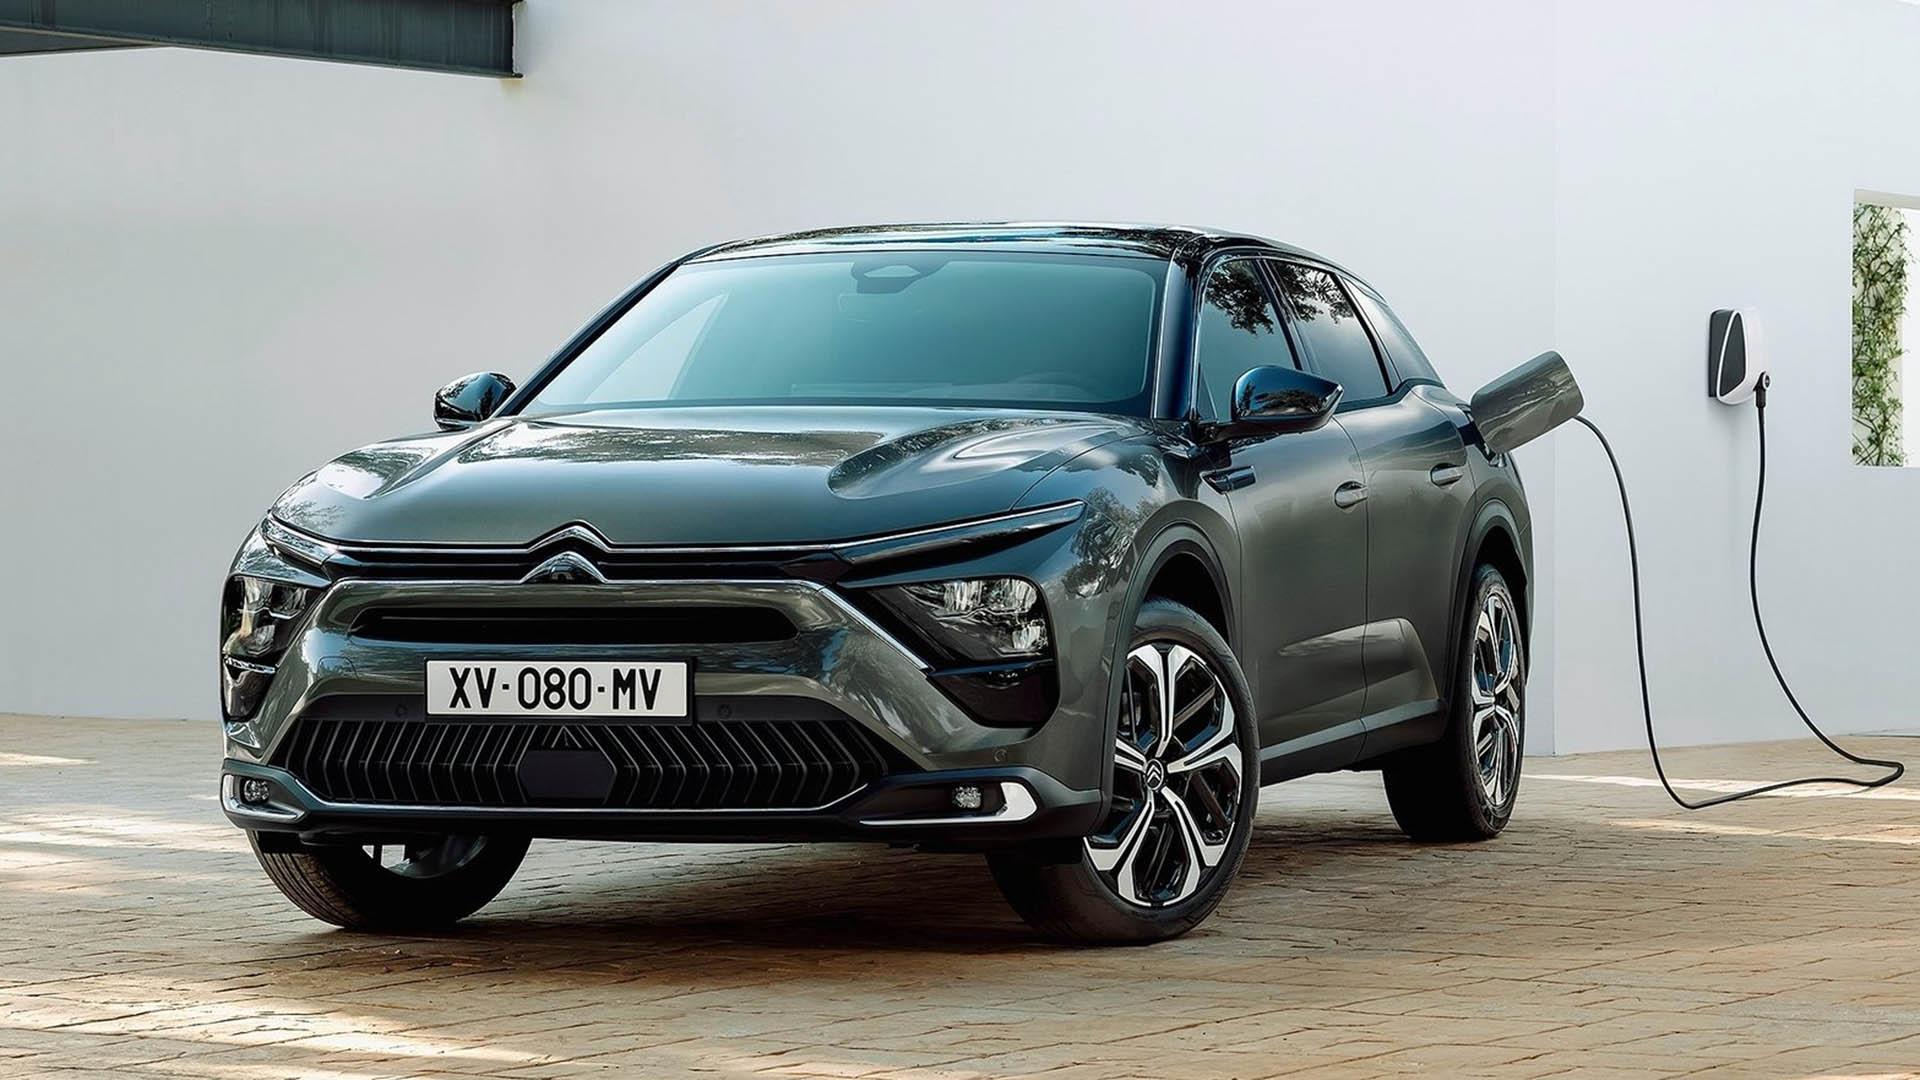 H Citroen σταματά την εξέλιξη των ντίζελ κινητήρων